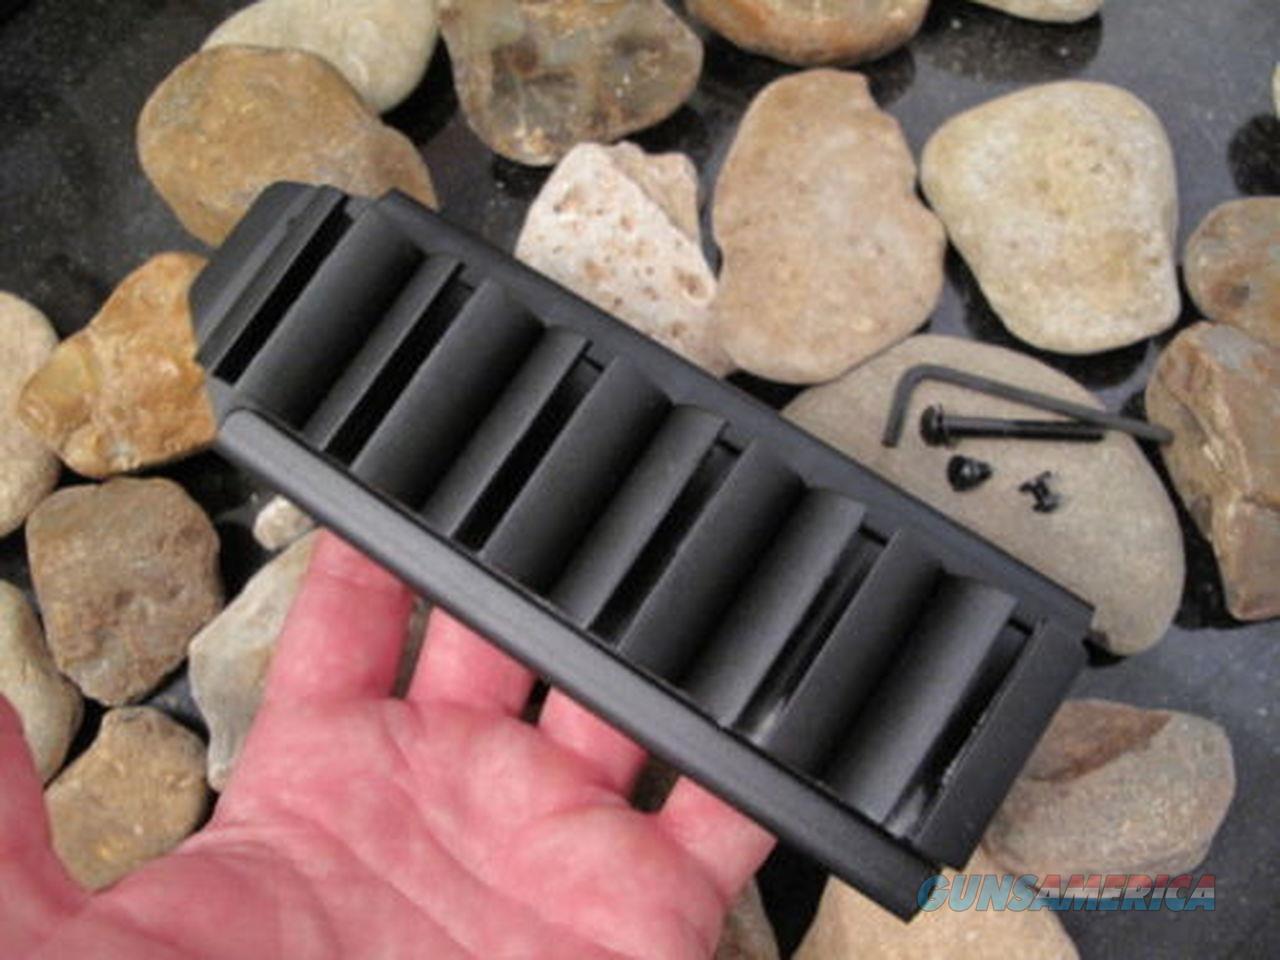 POLYMER Sidesaddle Fits MAVERICK 88 12 Gauge Shotgun Shell Holder LIFETIME WTY!!  Non-Guns > Ammunition